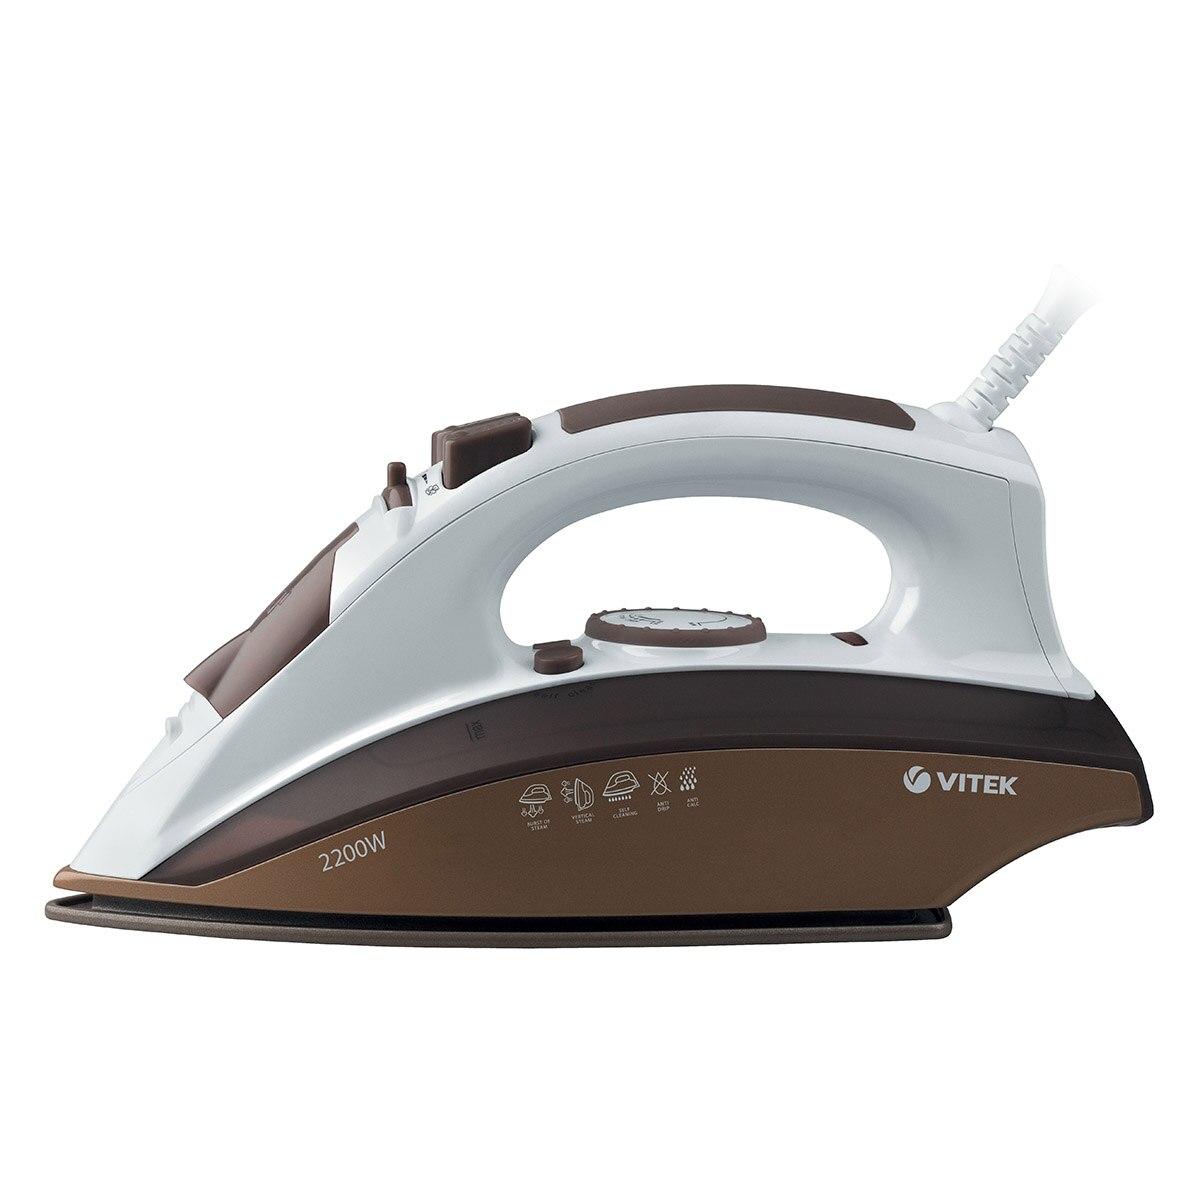 Iron VITEK VT-1201BN цена